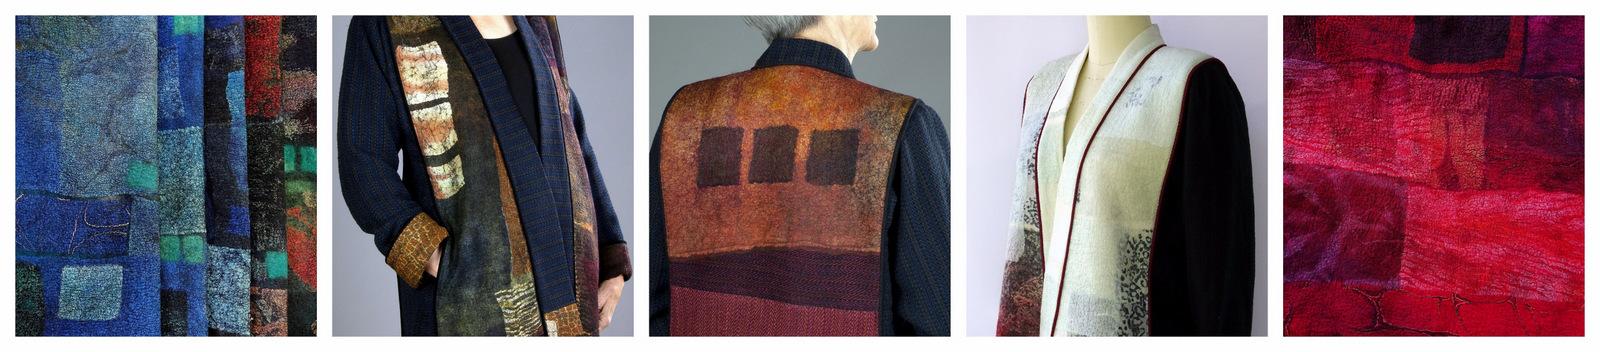 Handwoven Slow Fashion by Liz Spear-014.JPG